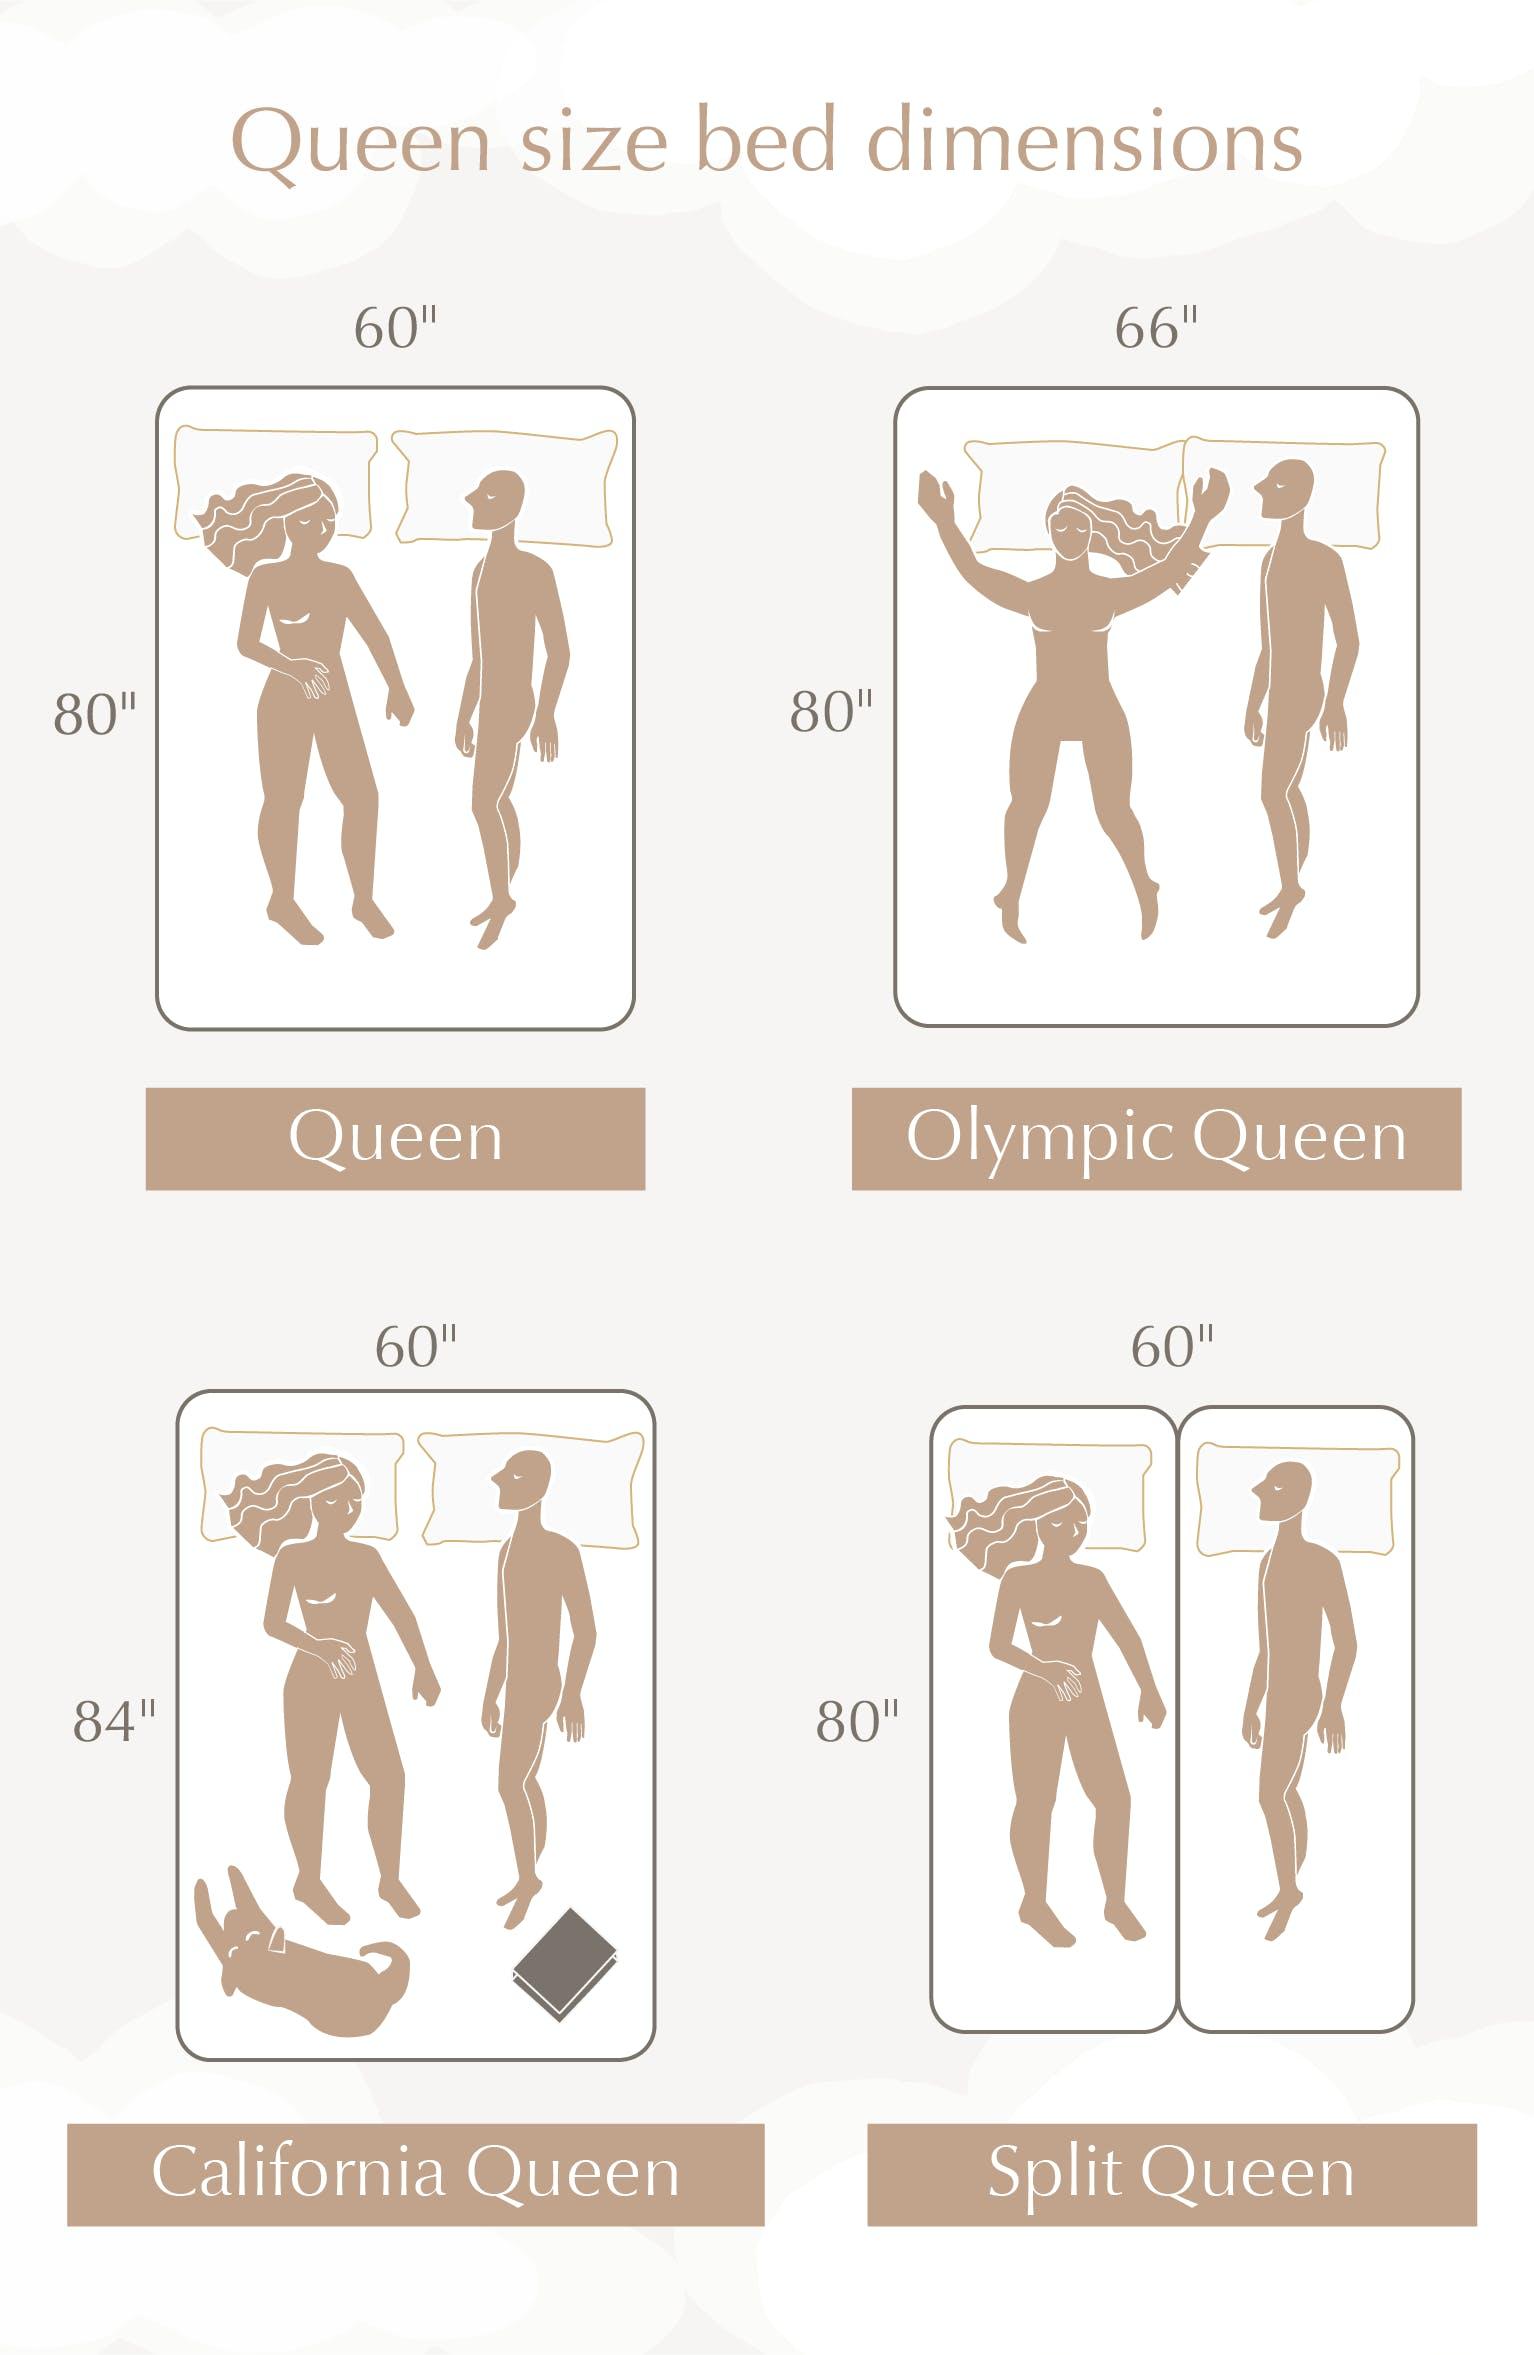 infographic showing the differences in size between queen, olympic queen, california queen, and split queen beds